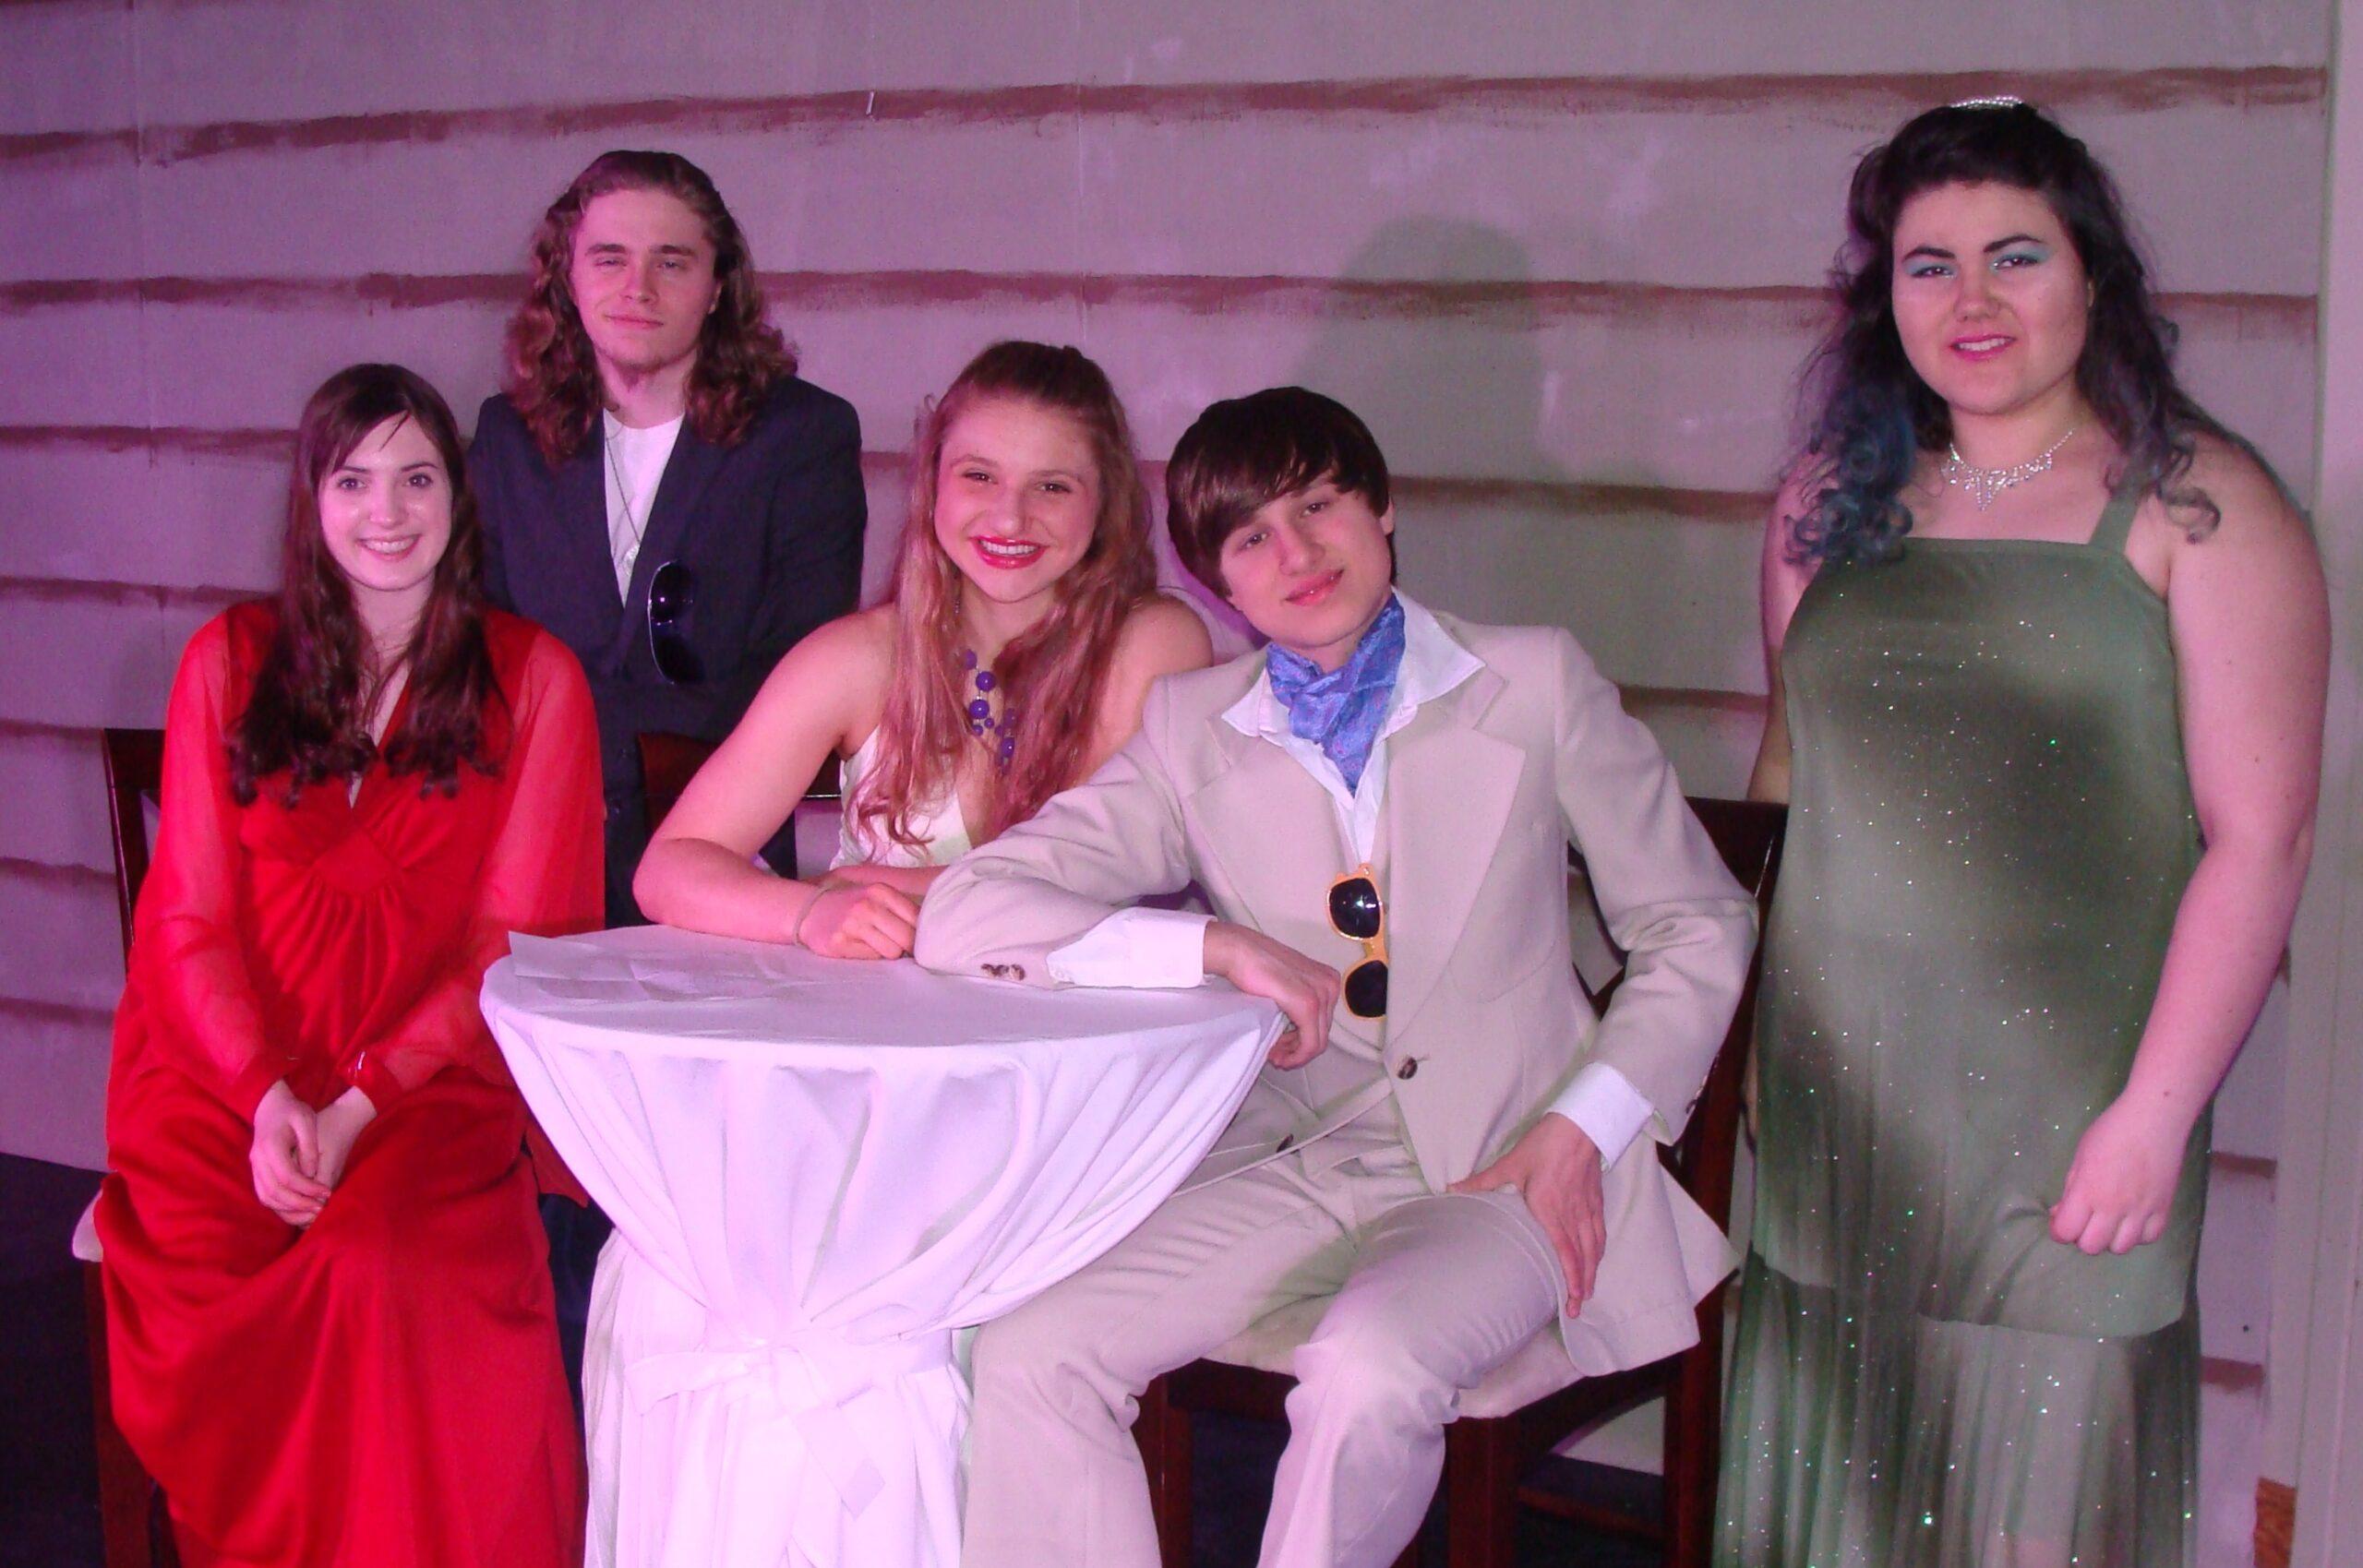 Murder at the Prom Teen Program